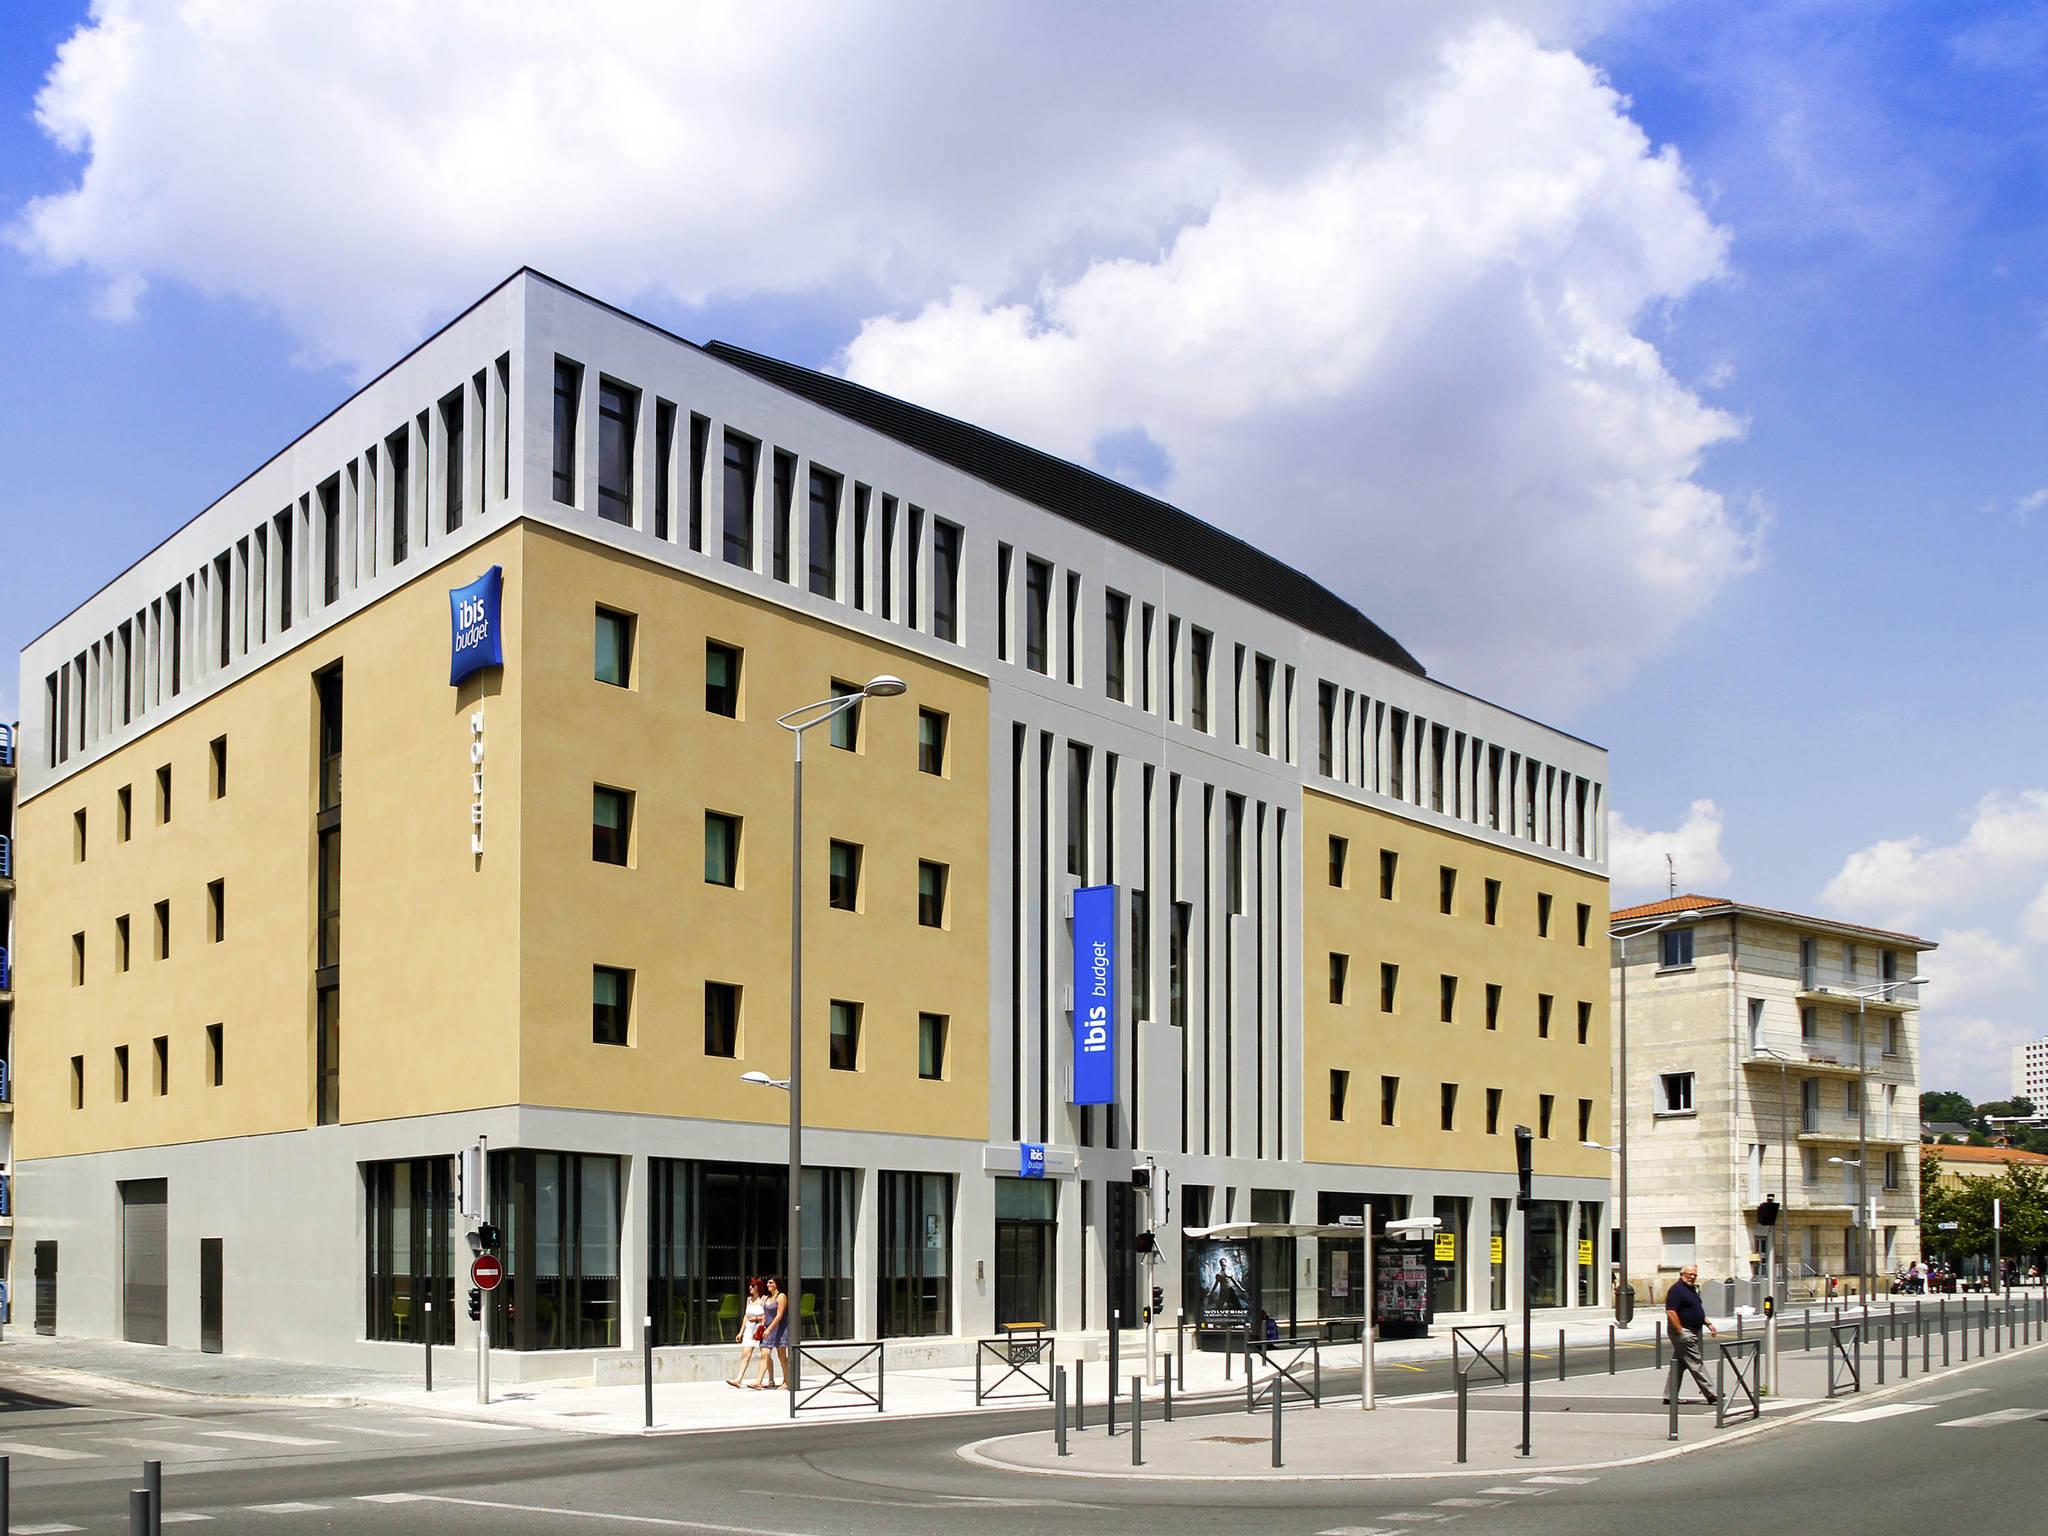 Otel – ibis budget Poitiers Centre Gare